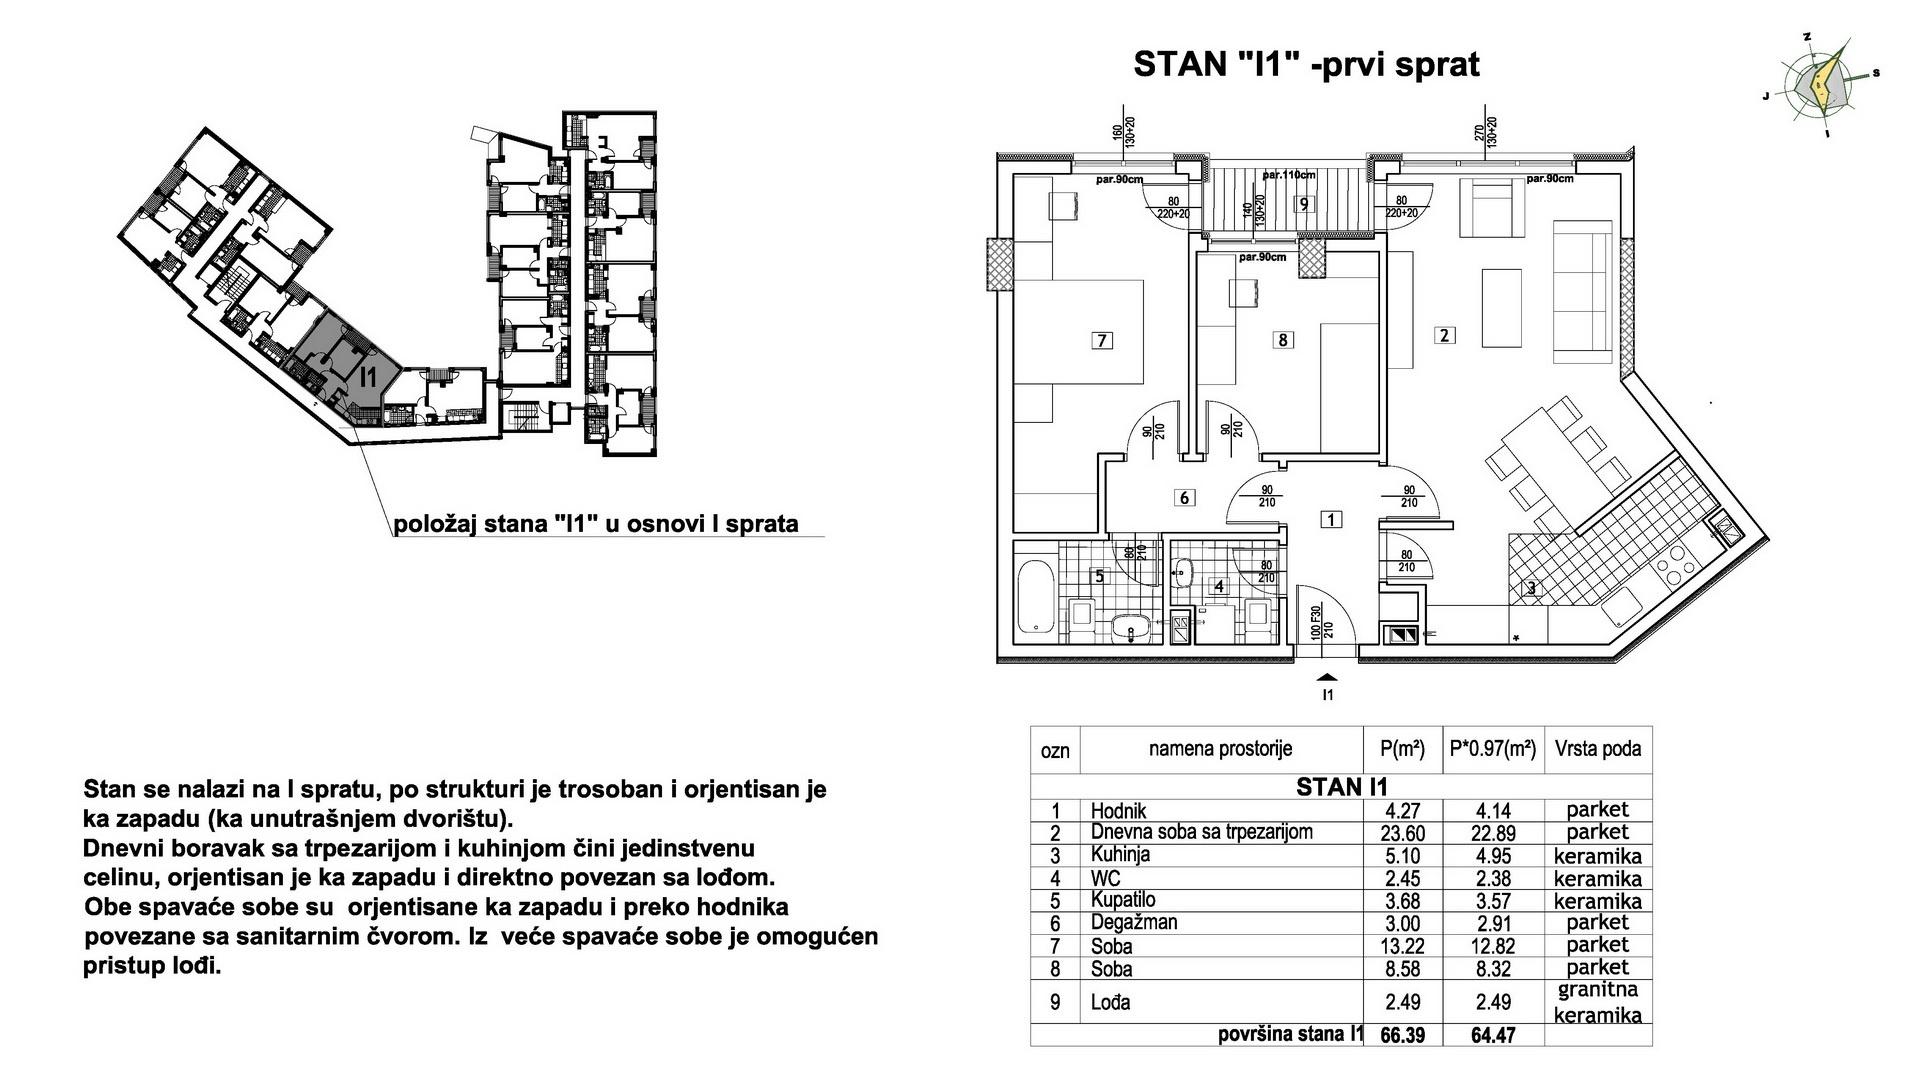 Objekat u Prešernovoj bb - Stan I1